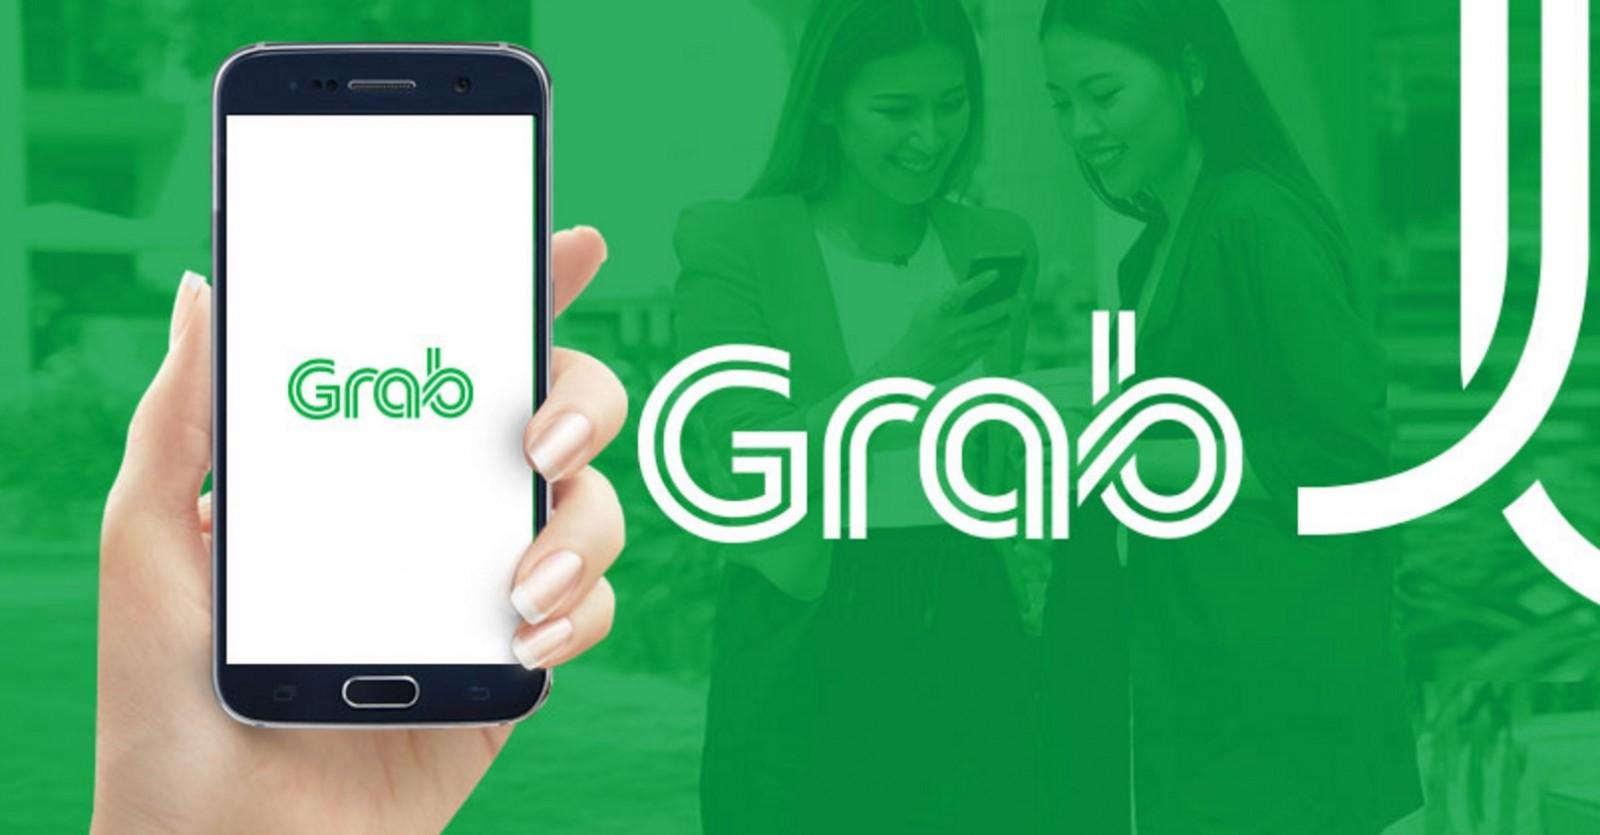 Grab 希望通过 Grab Ventures 推动东南亚科技生态系统发展